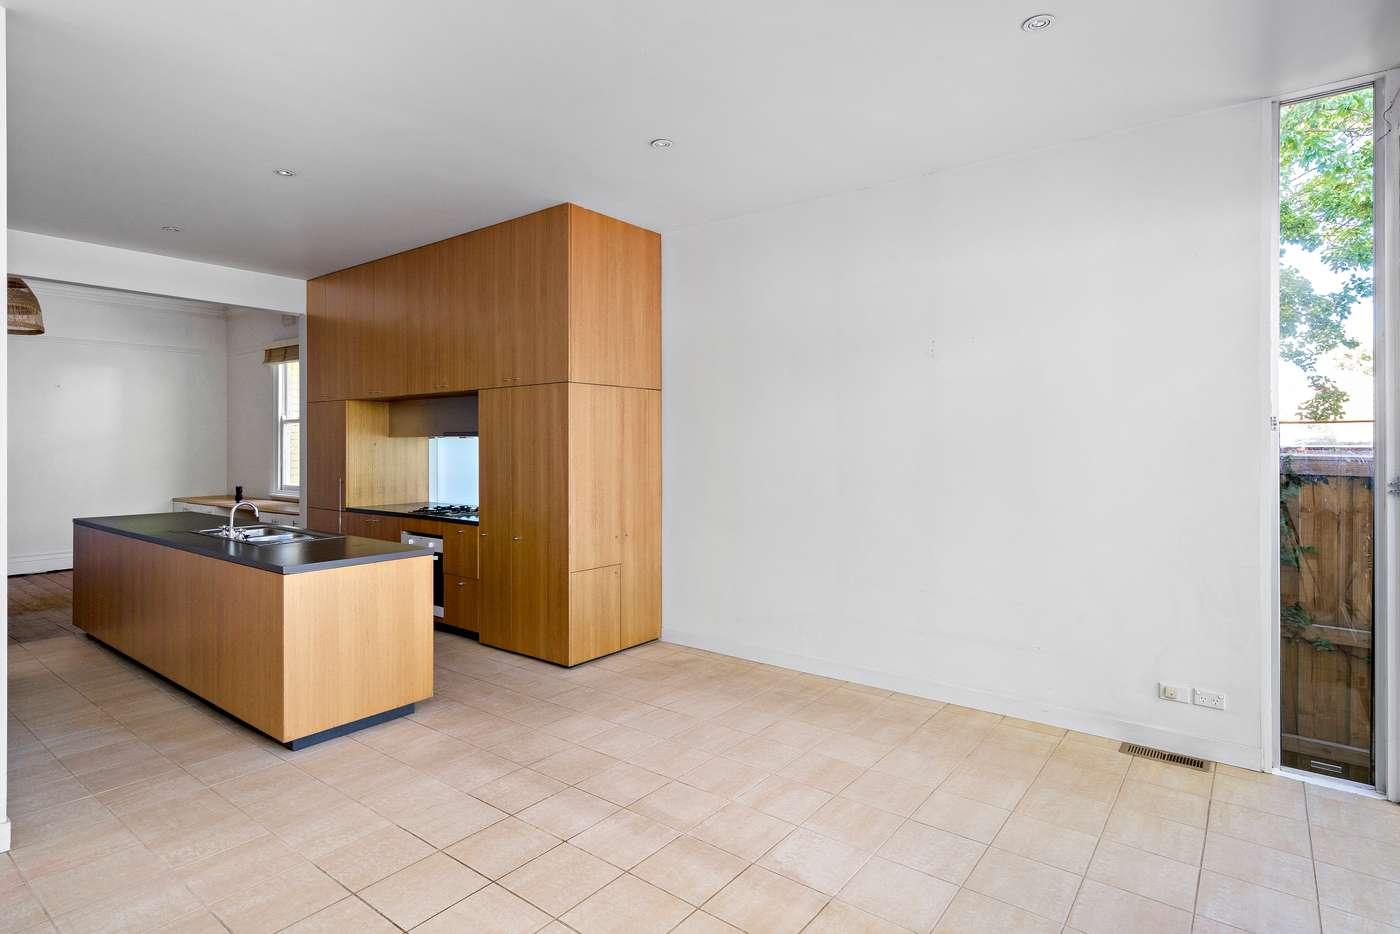 Sixth view of Homely house listing, 87 Chomley Street, Prahran VIC 3181